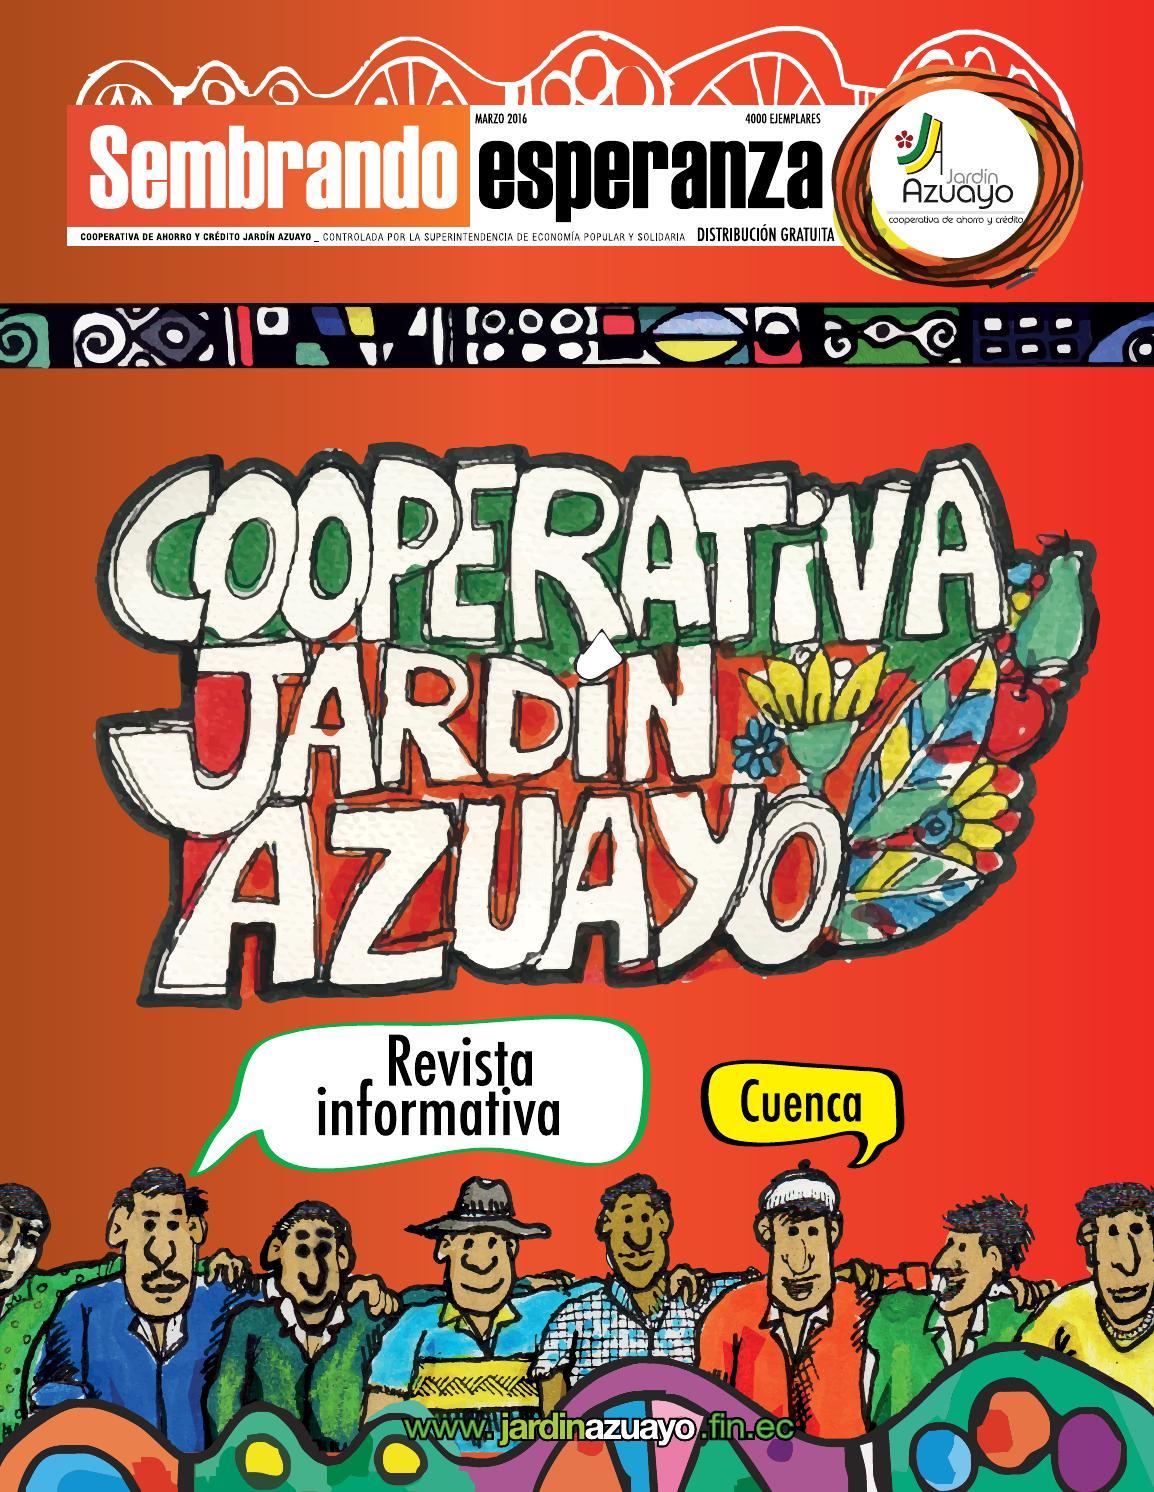 Revista sembrando esperanza cuenca 2016 by jardinazuayo for Jardin azuayo